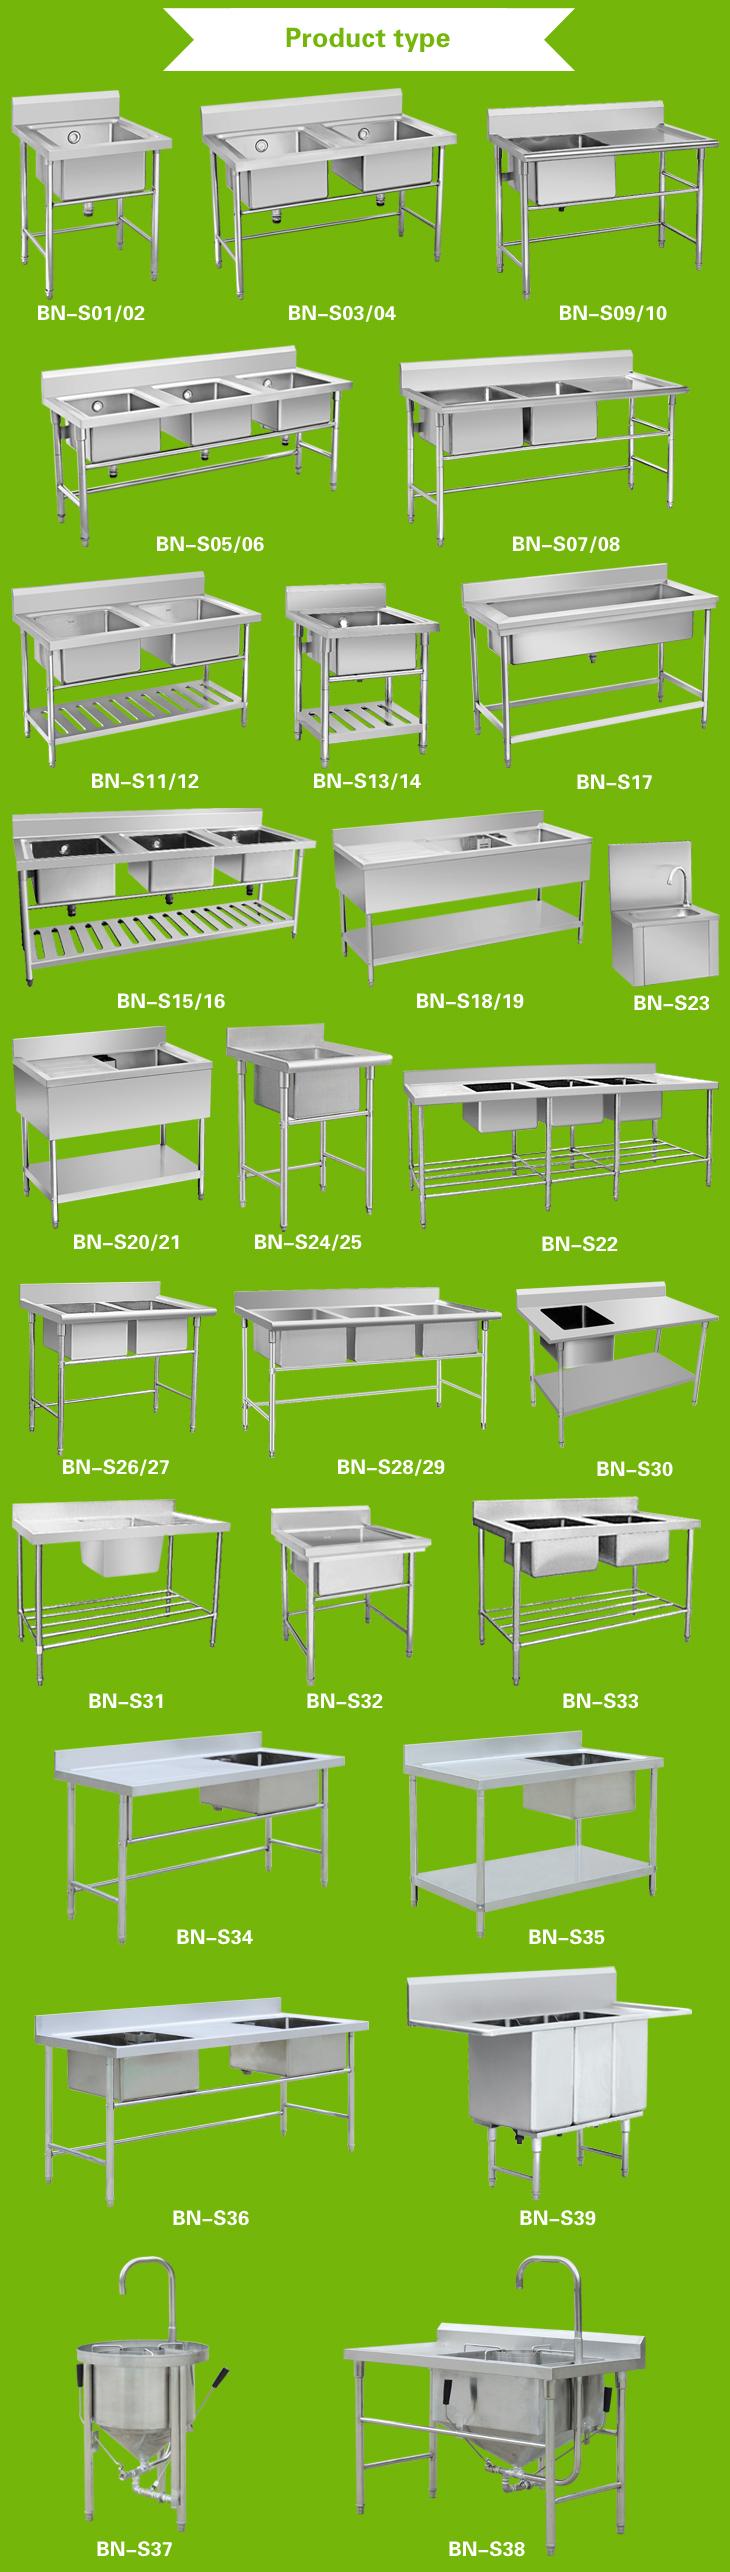 freien freistehende sp le tisch edelstahl handw sche sp le bank buy outdoor sp le tisch. Black Bedroom Furniture Sets. Home Design Ideas